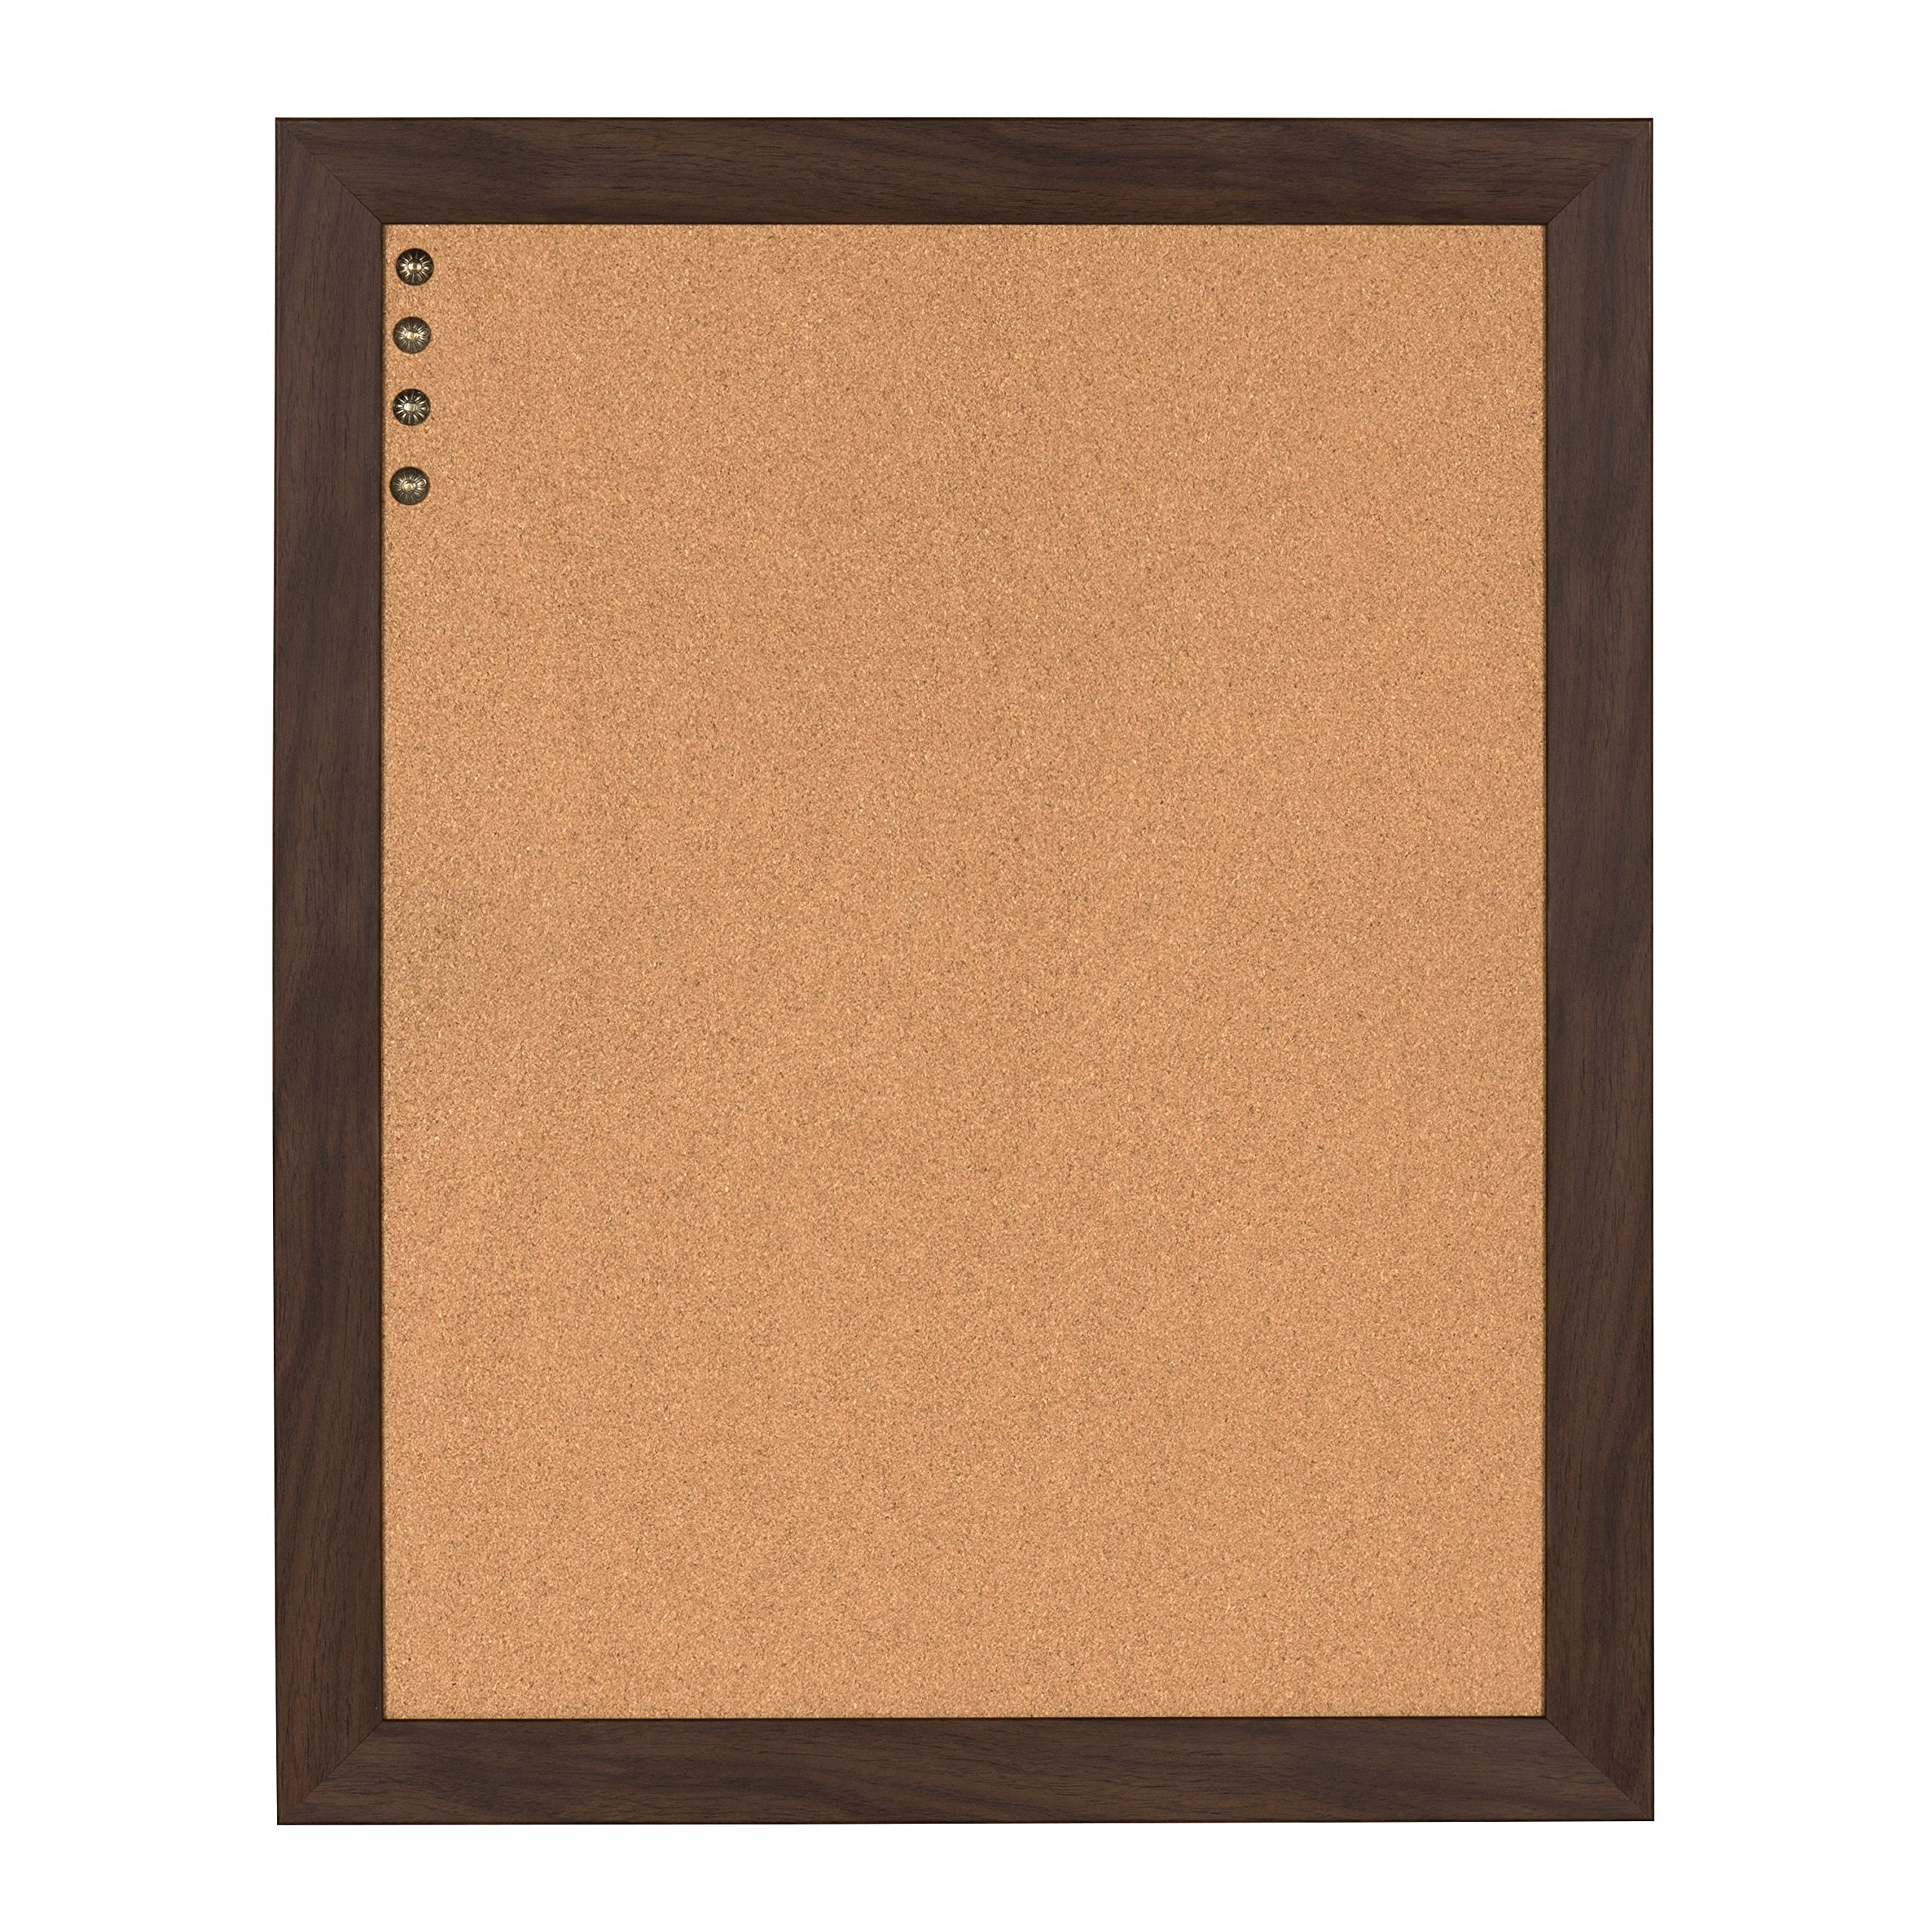 DesignOvation Beatrice Framed Corkboard, 23x29, Walnut Brown